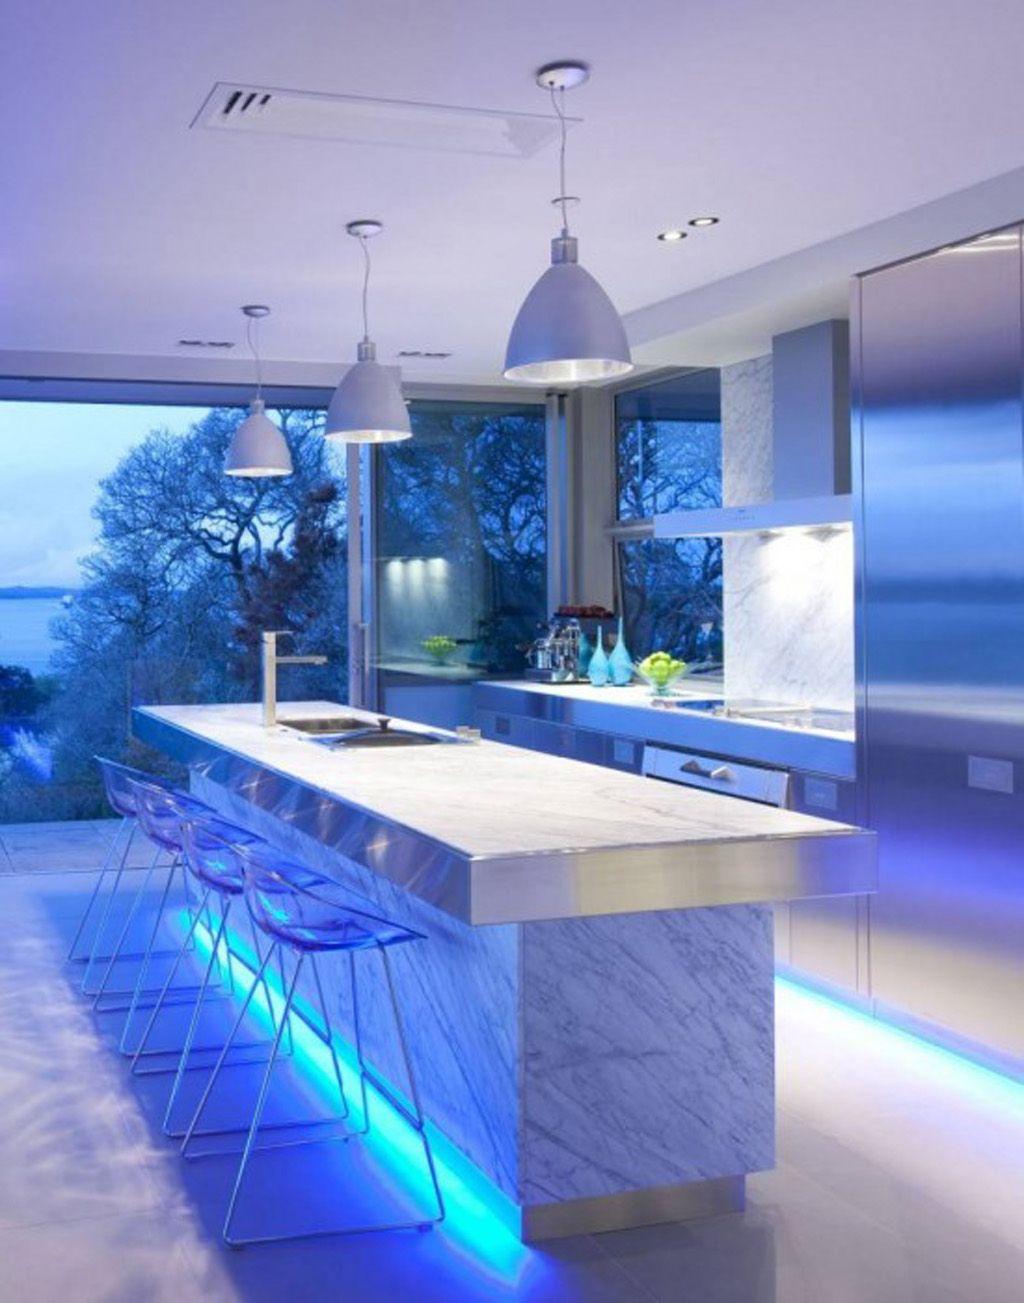 Kitchens by design kitchen design with led lighting fixtures ultra modern kitchen design